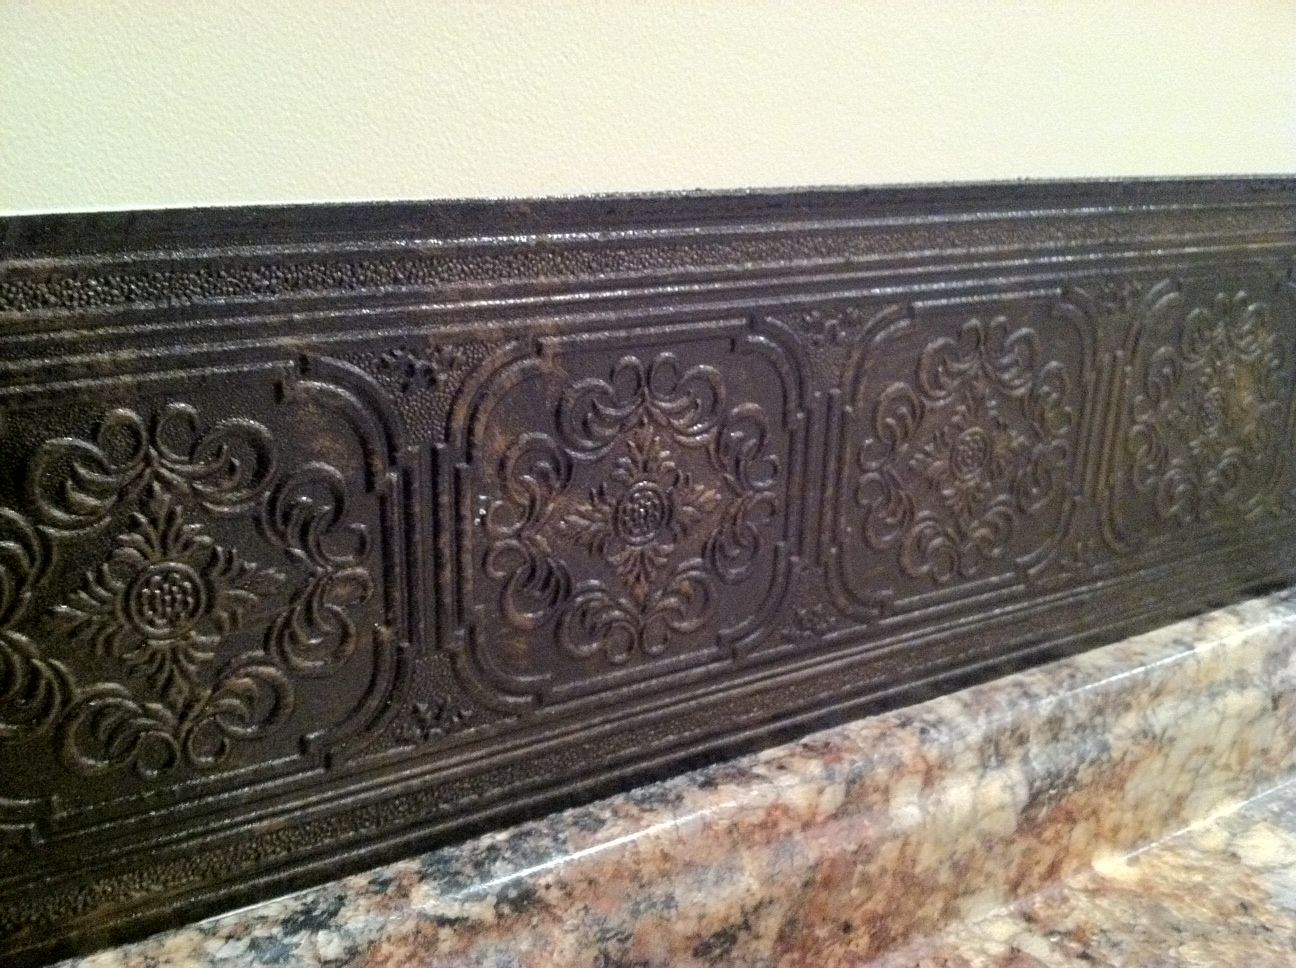 Backsplash idea! Paintable wallpaper with a faux metallic